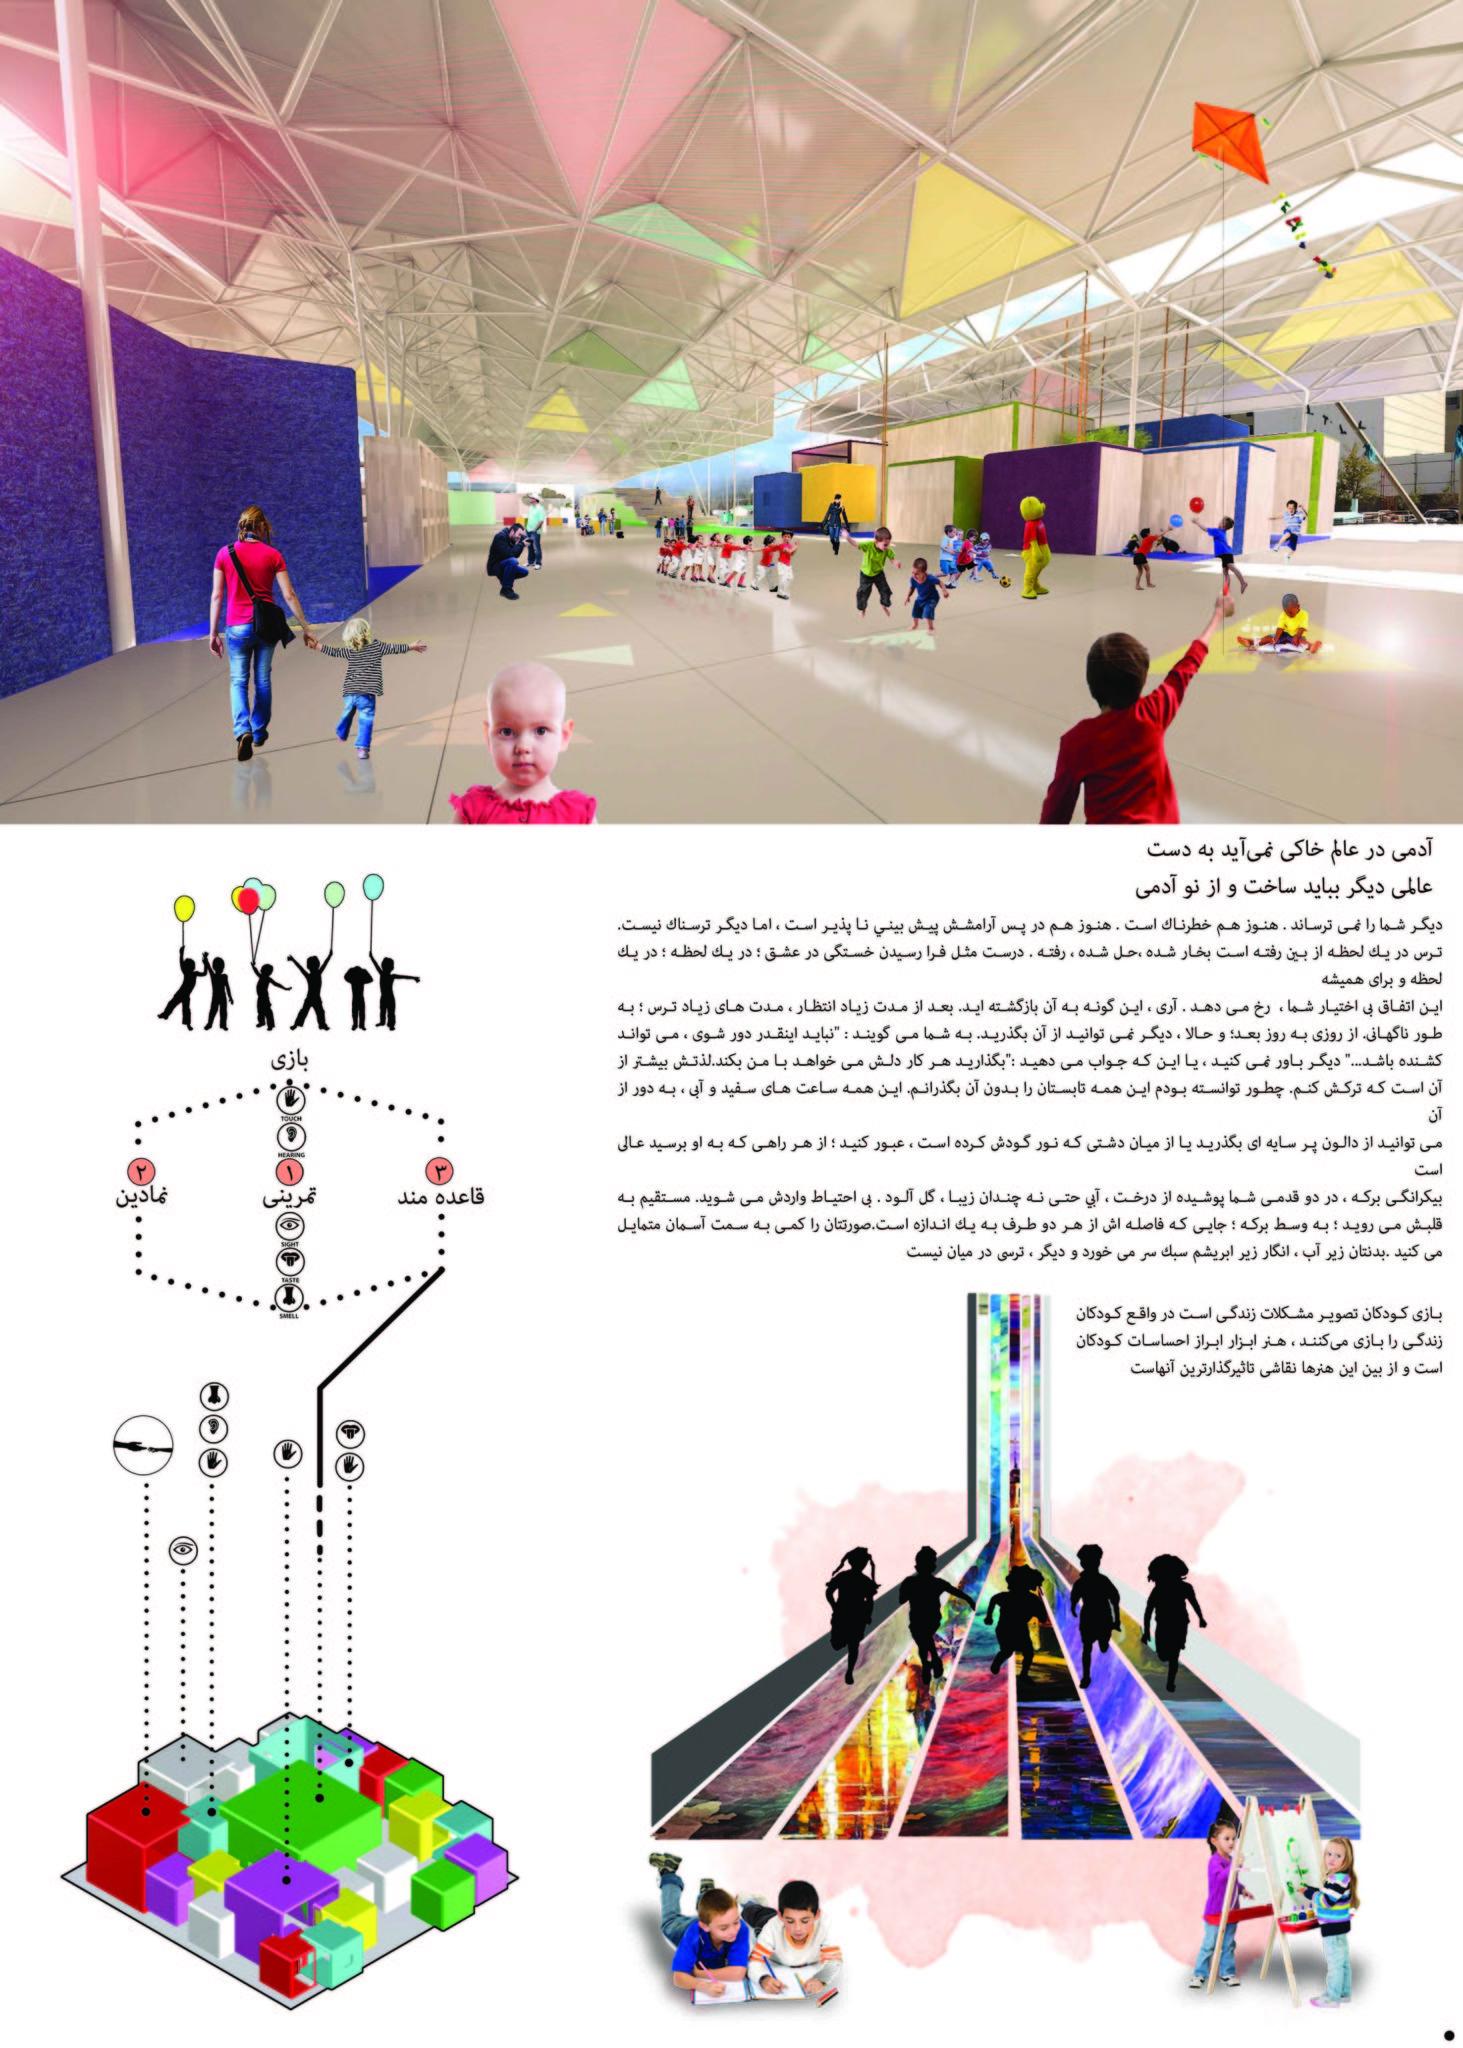 4 architecture studio competition sheet, شیت بیمارستان مسابقه معماری استودیو معماری شماره چهار